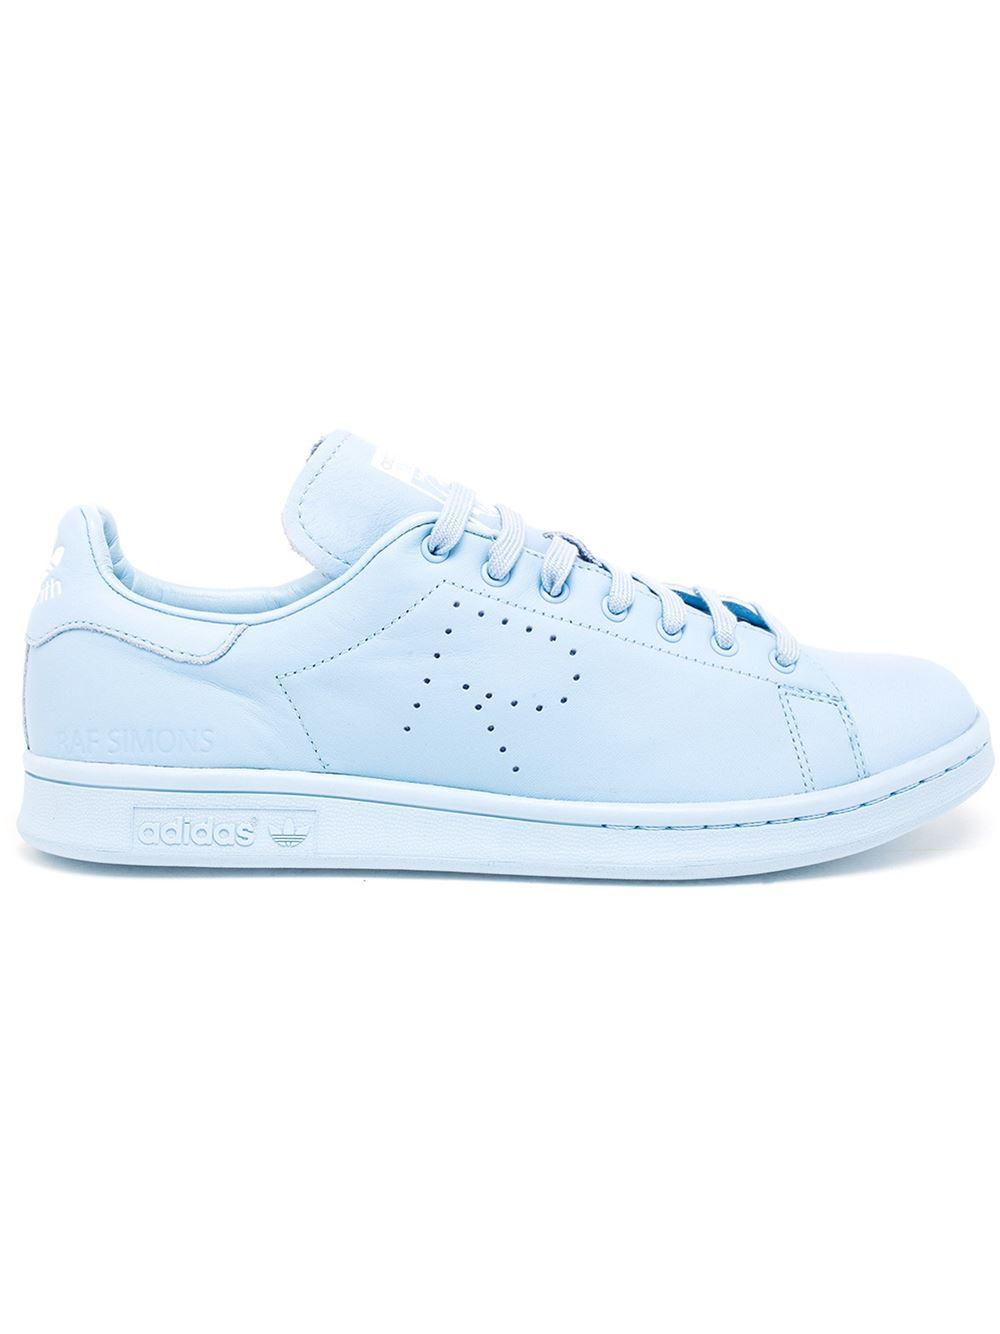 Adidas x Raf Simons Stan Smith Baby Blue | soldoutstore